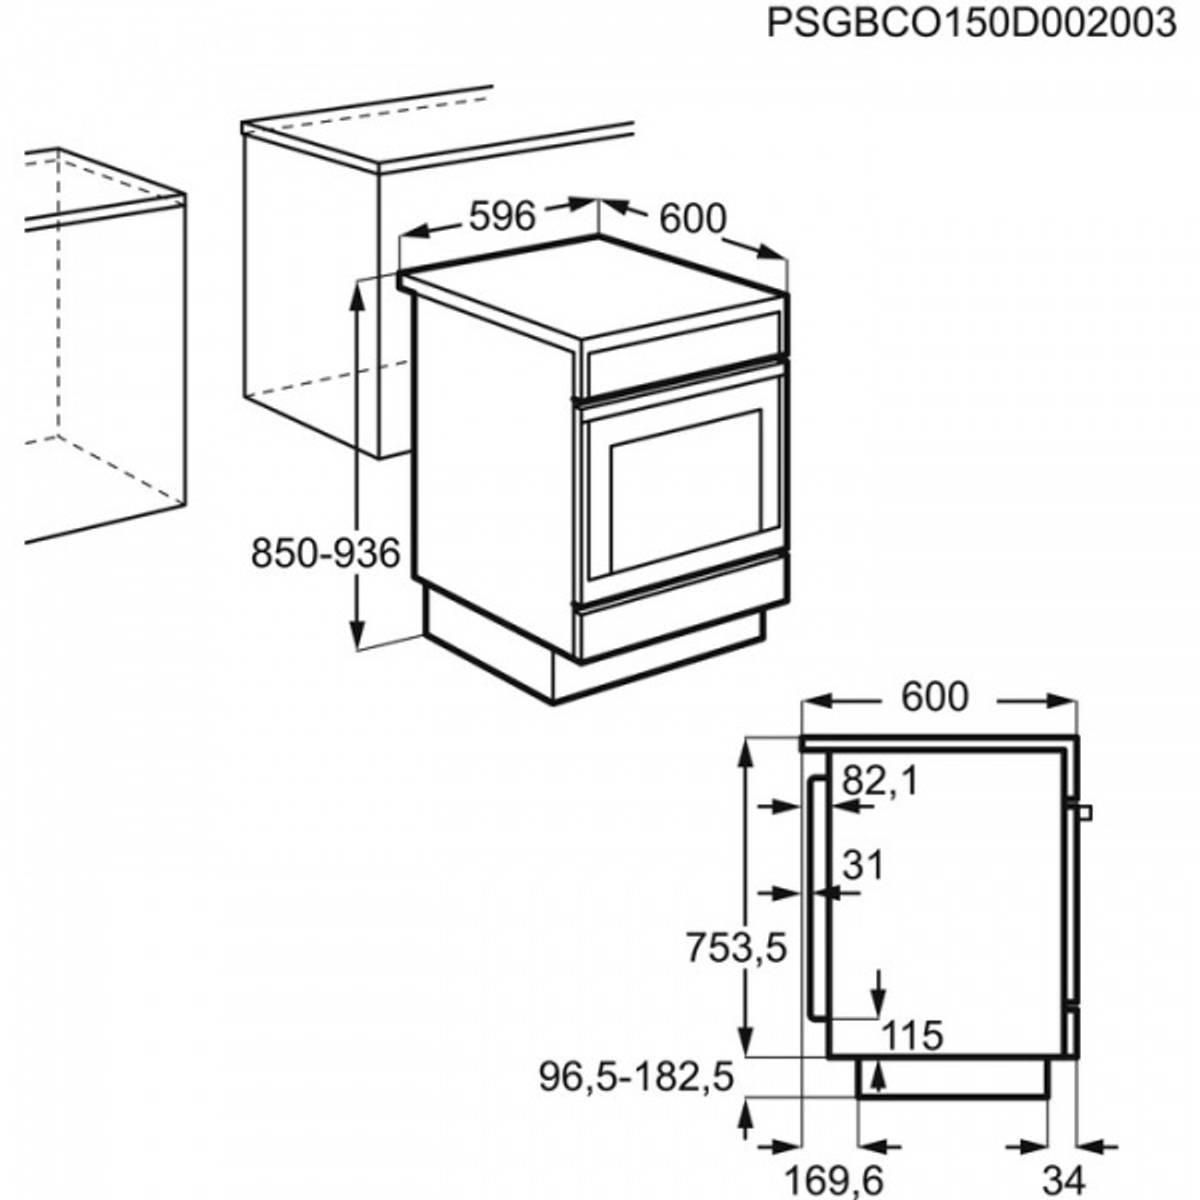 Electrolux komfyr keramisk hvit EKC6051FOW